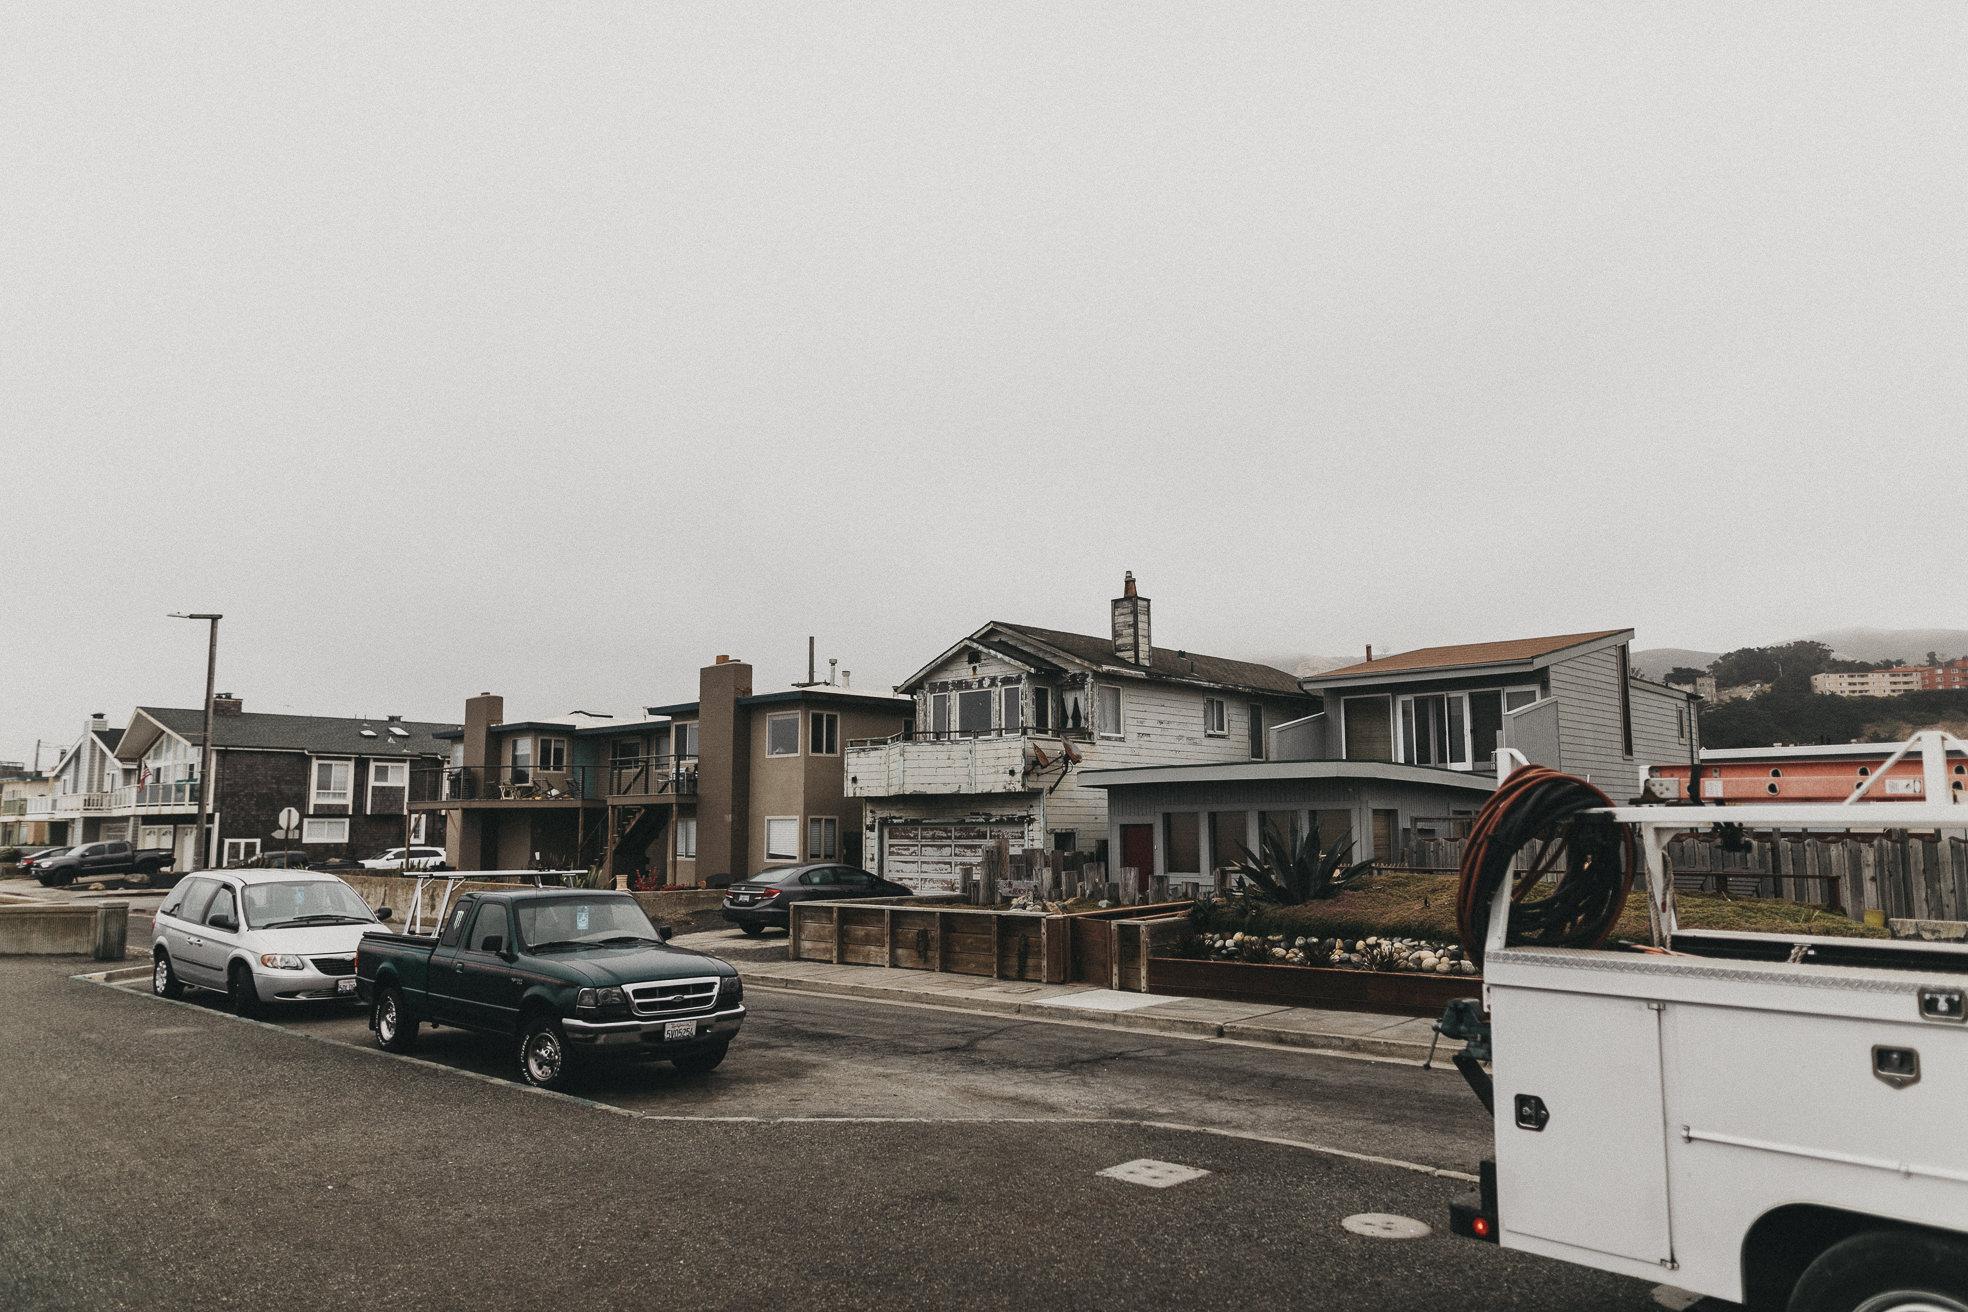 San-Francisco-BildervomLeben-9816